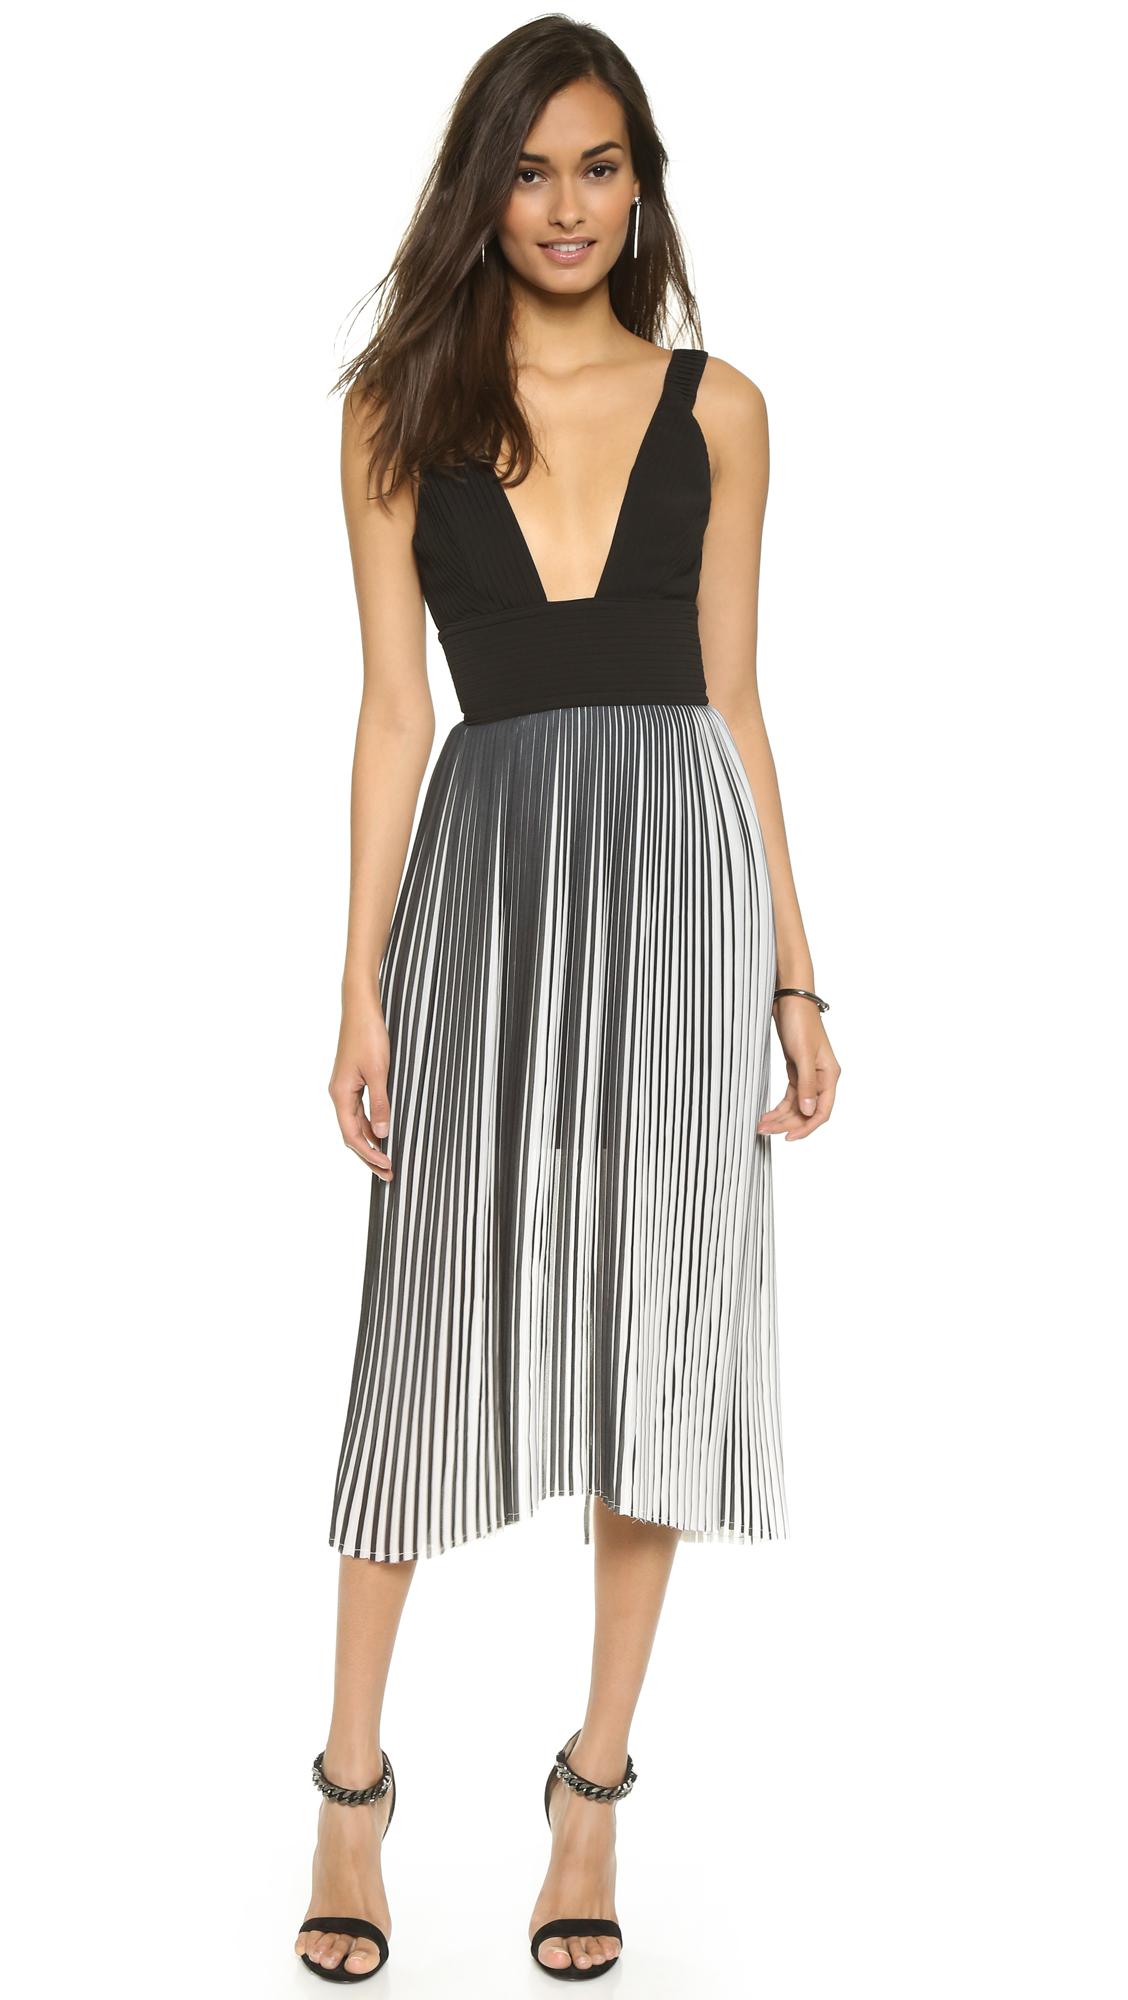 Nicholas Sleeveless Pleat Dress Sale Low Shipping Fee Buy Cheap Supply Order 9q1UKSWqdf